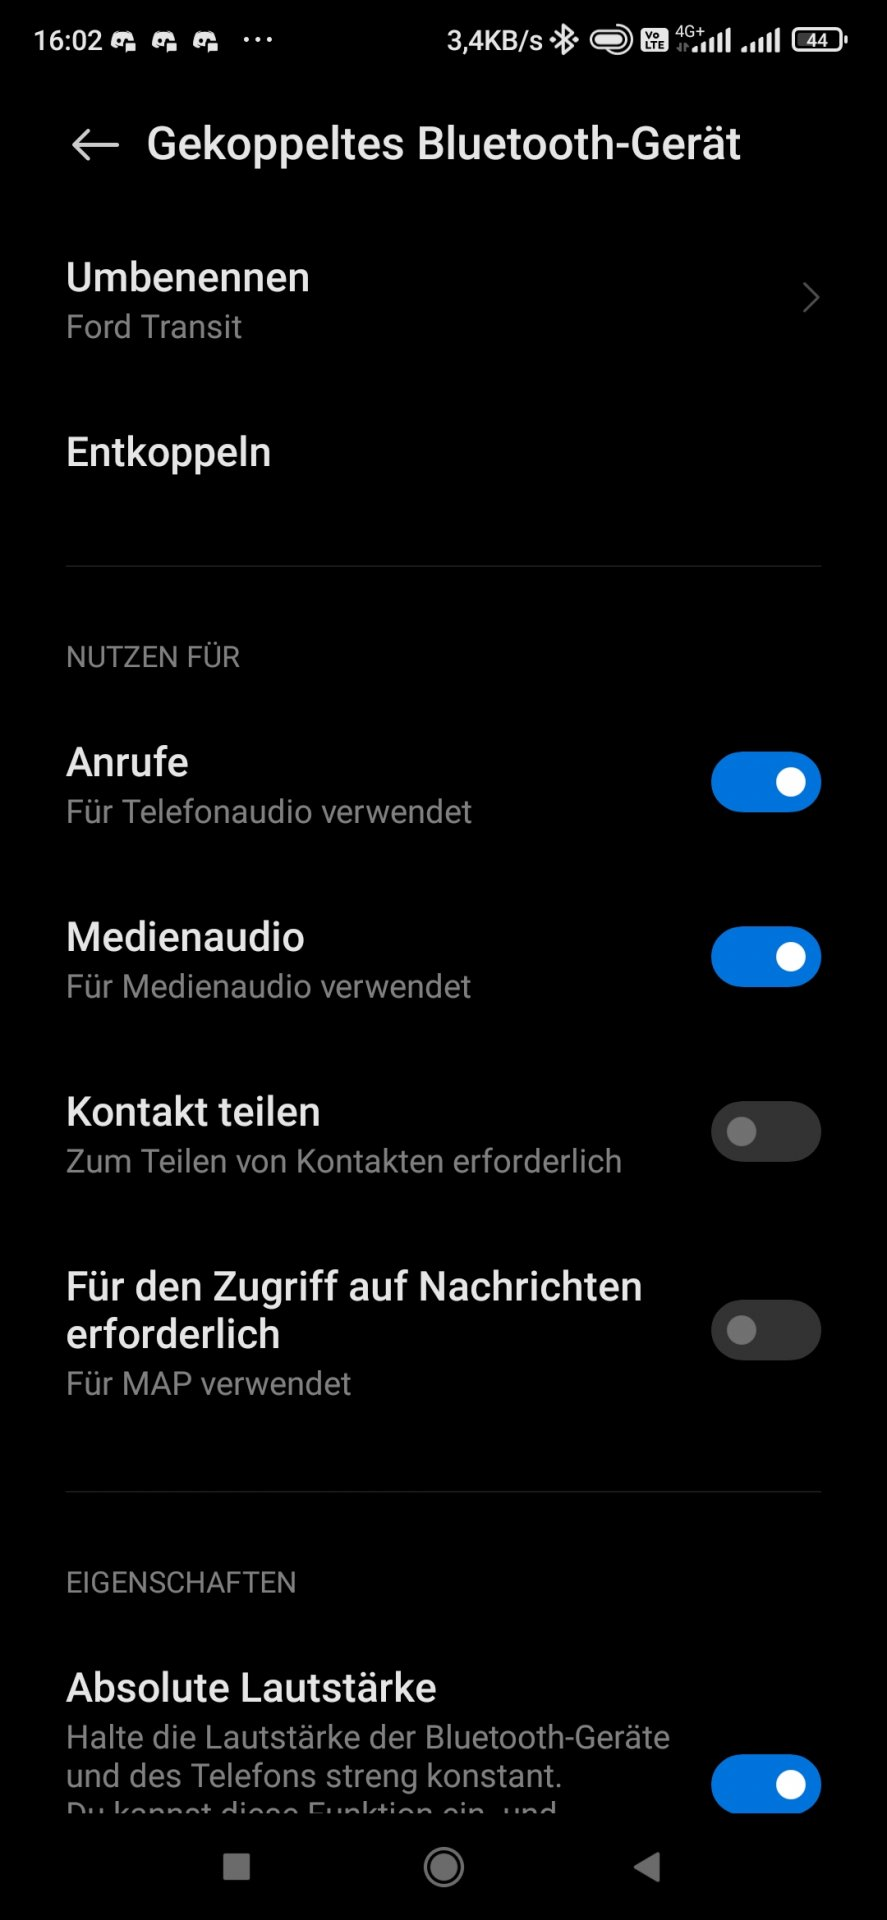 Screenshot_2021-07-29-16-02-36-605_com.android.settings.jpg